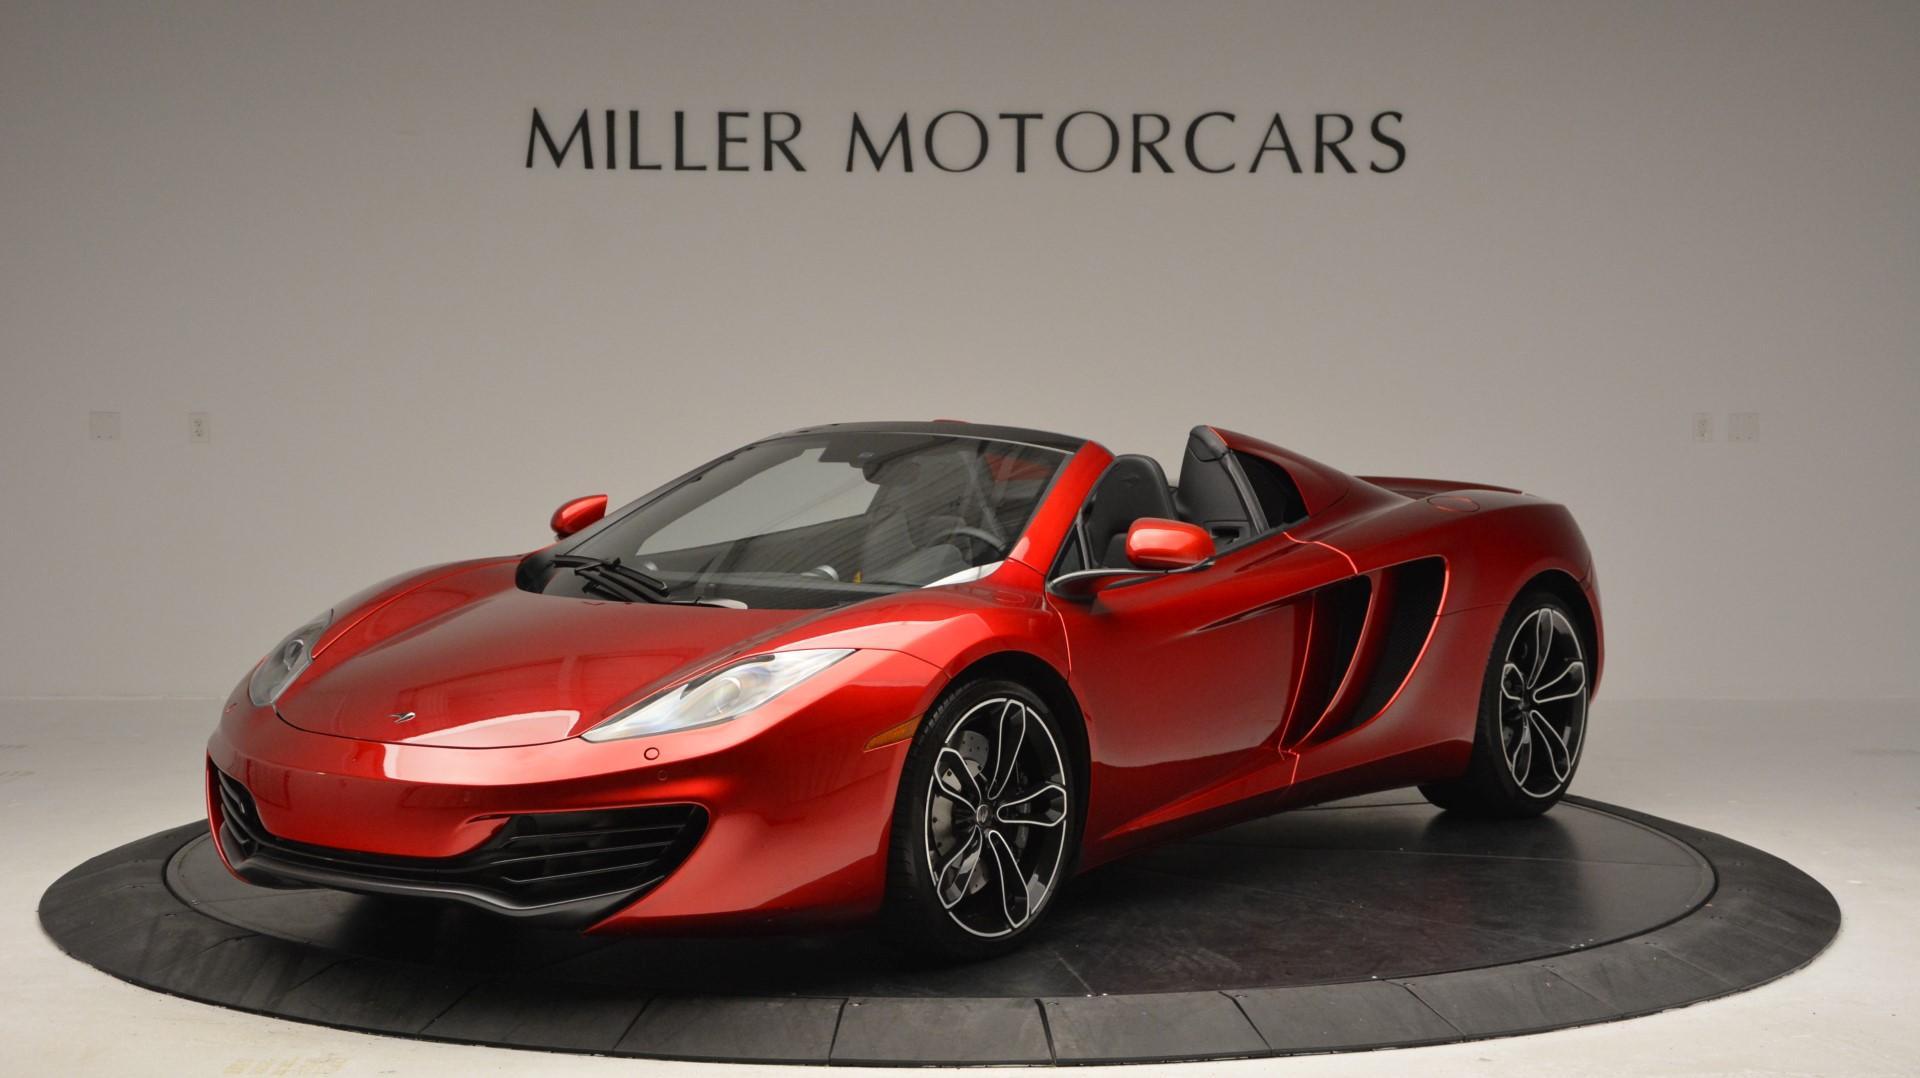 Used 2013 McLaren 12C Spider  For Sale In Greenwich, CT. Alfa Romeo of Greenwich, 3045 67_main